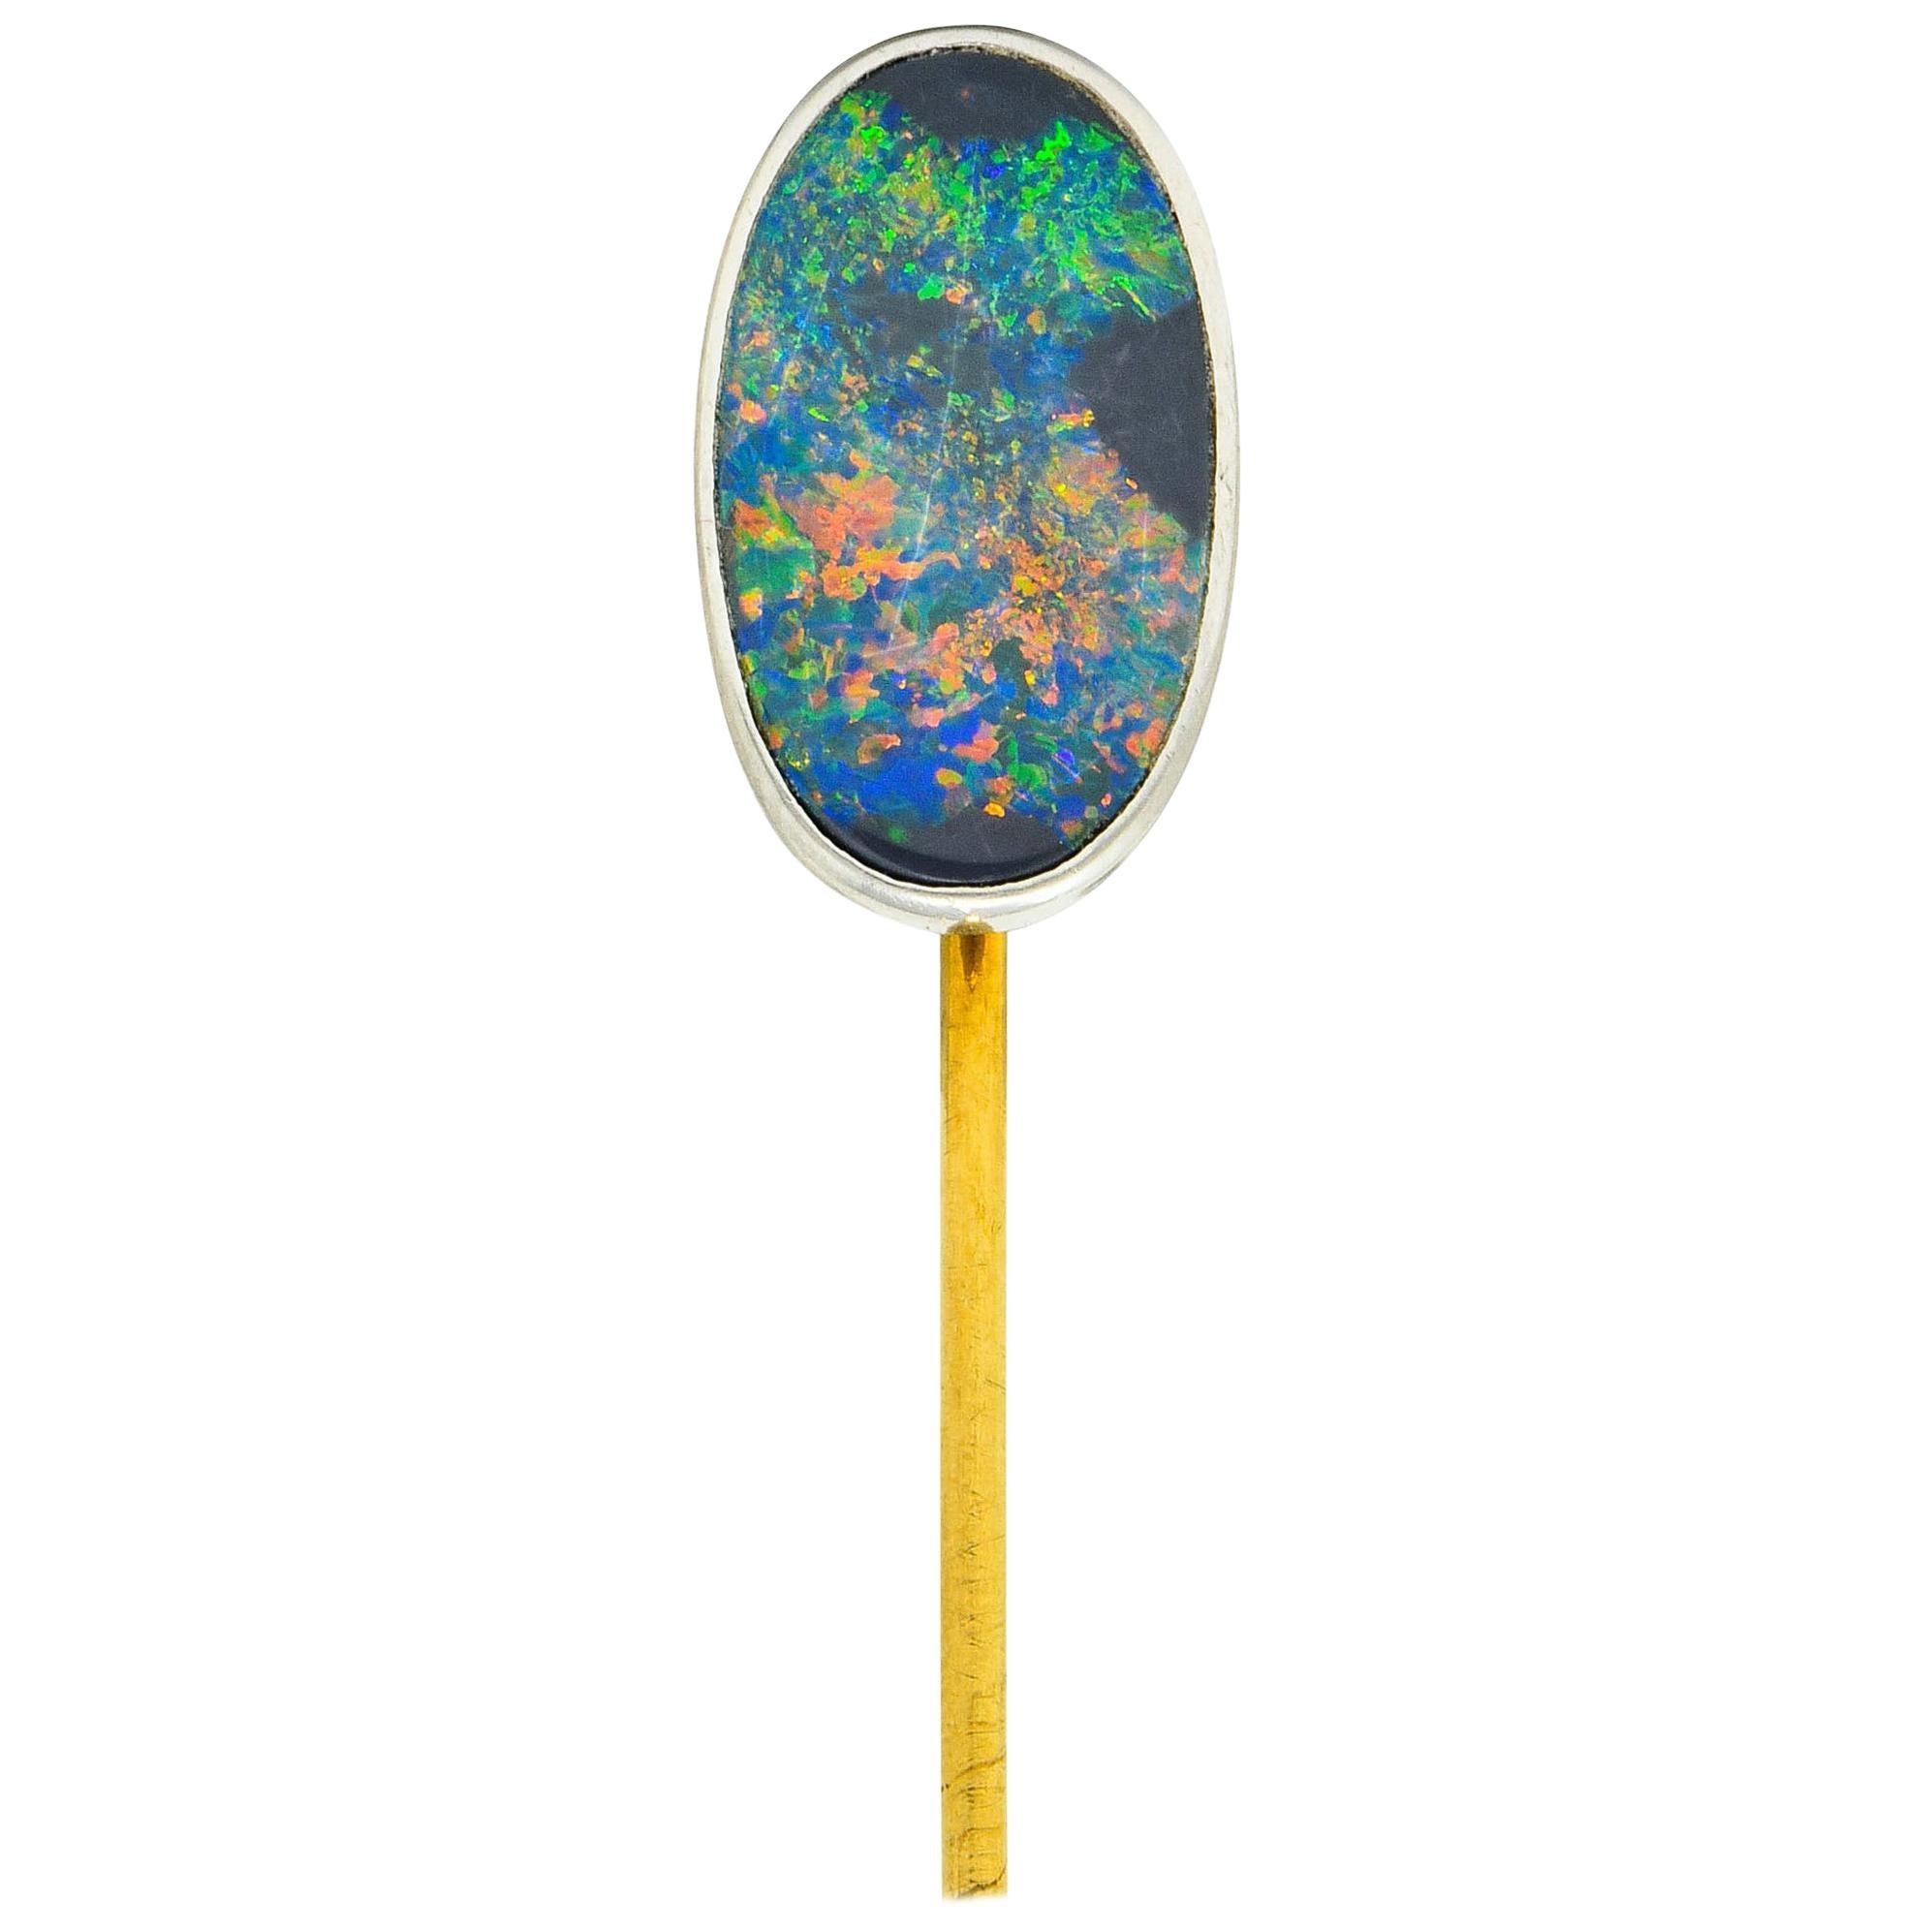 Tiffany & Co. Edwardian Black Opal Platinum 18 Karat Gold Stickpin